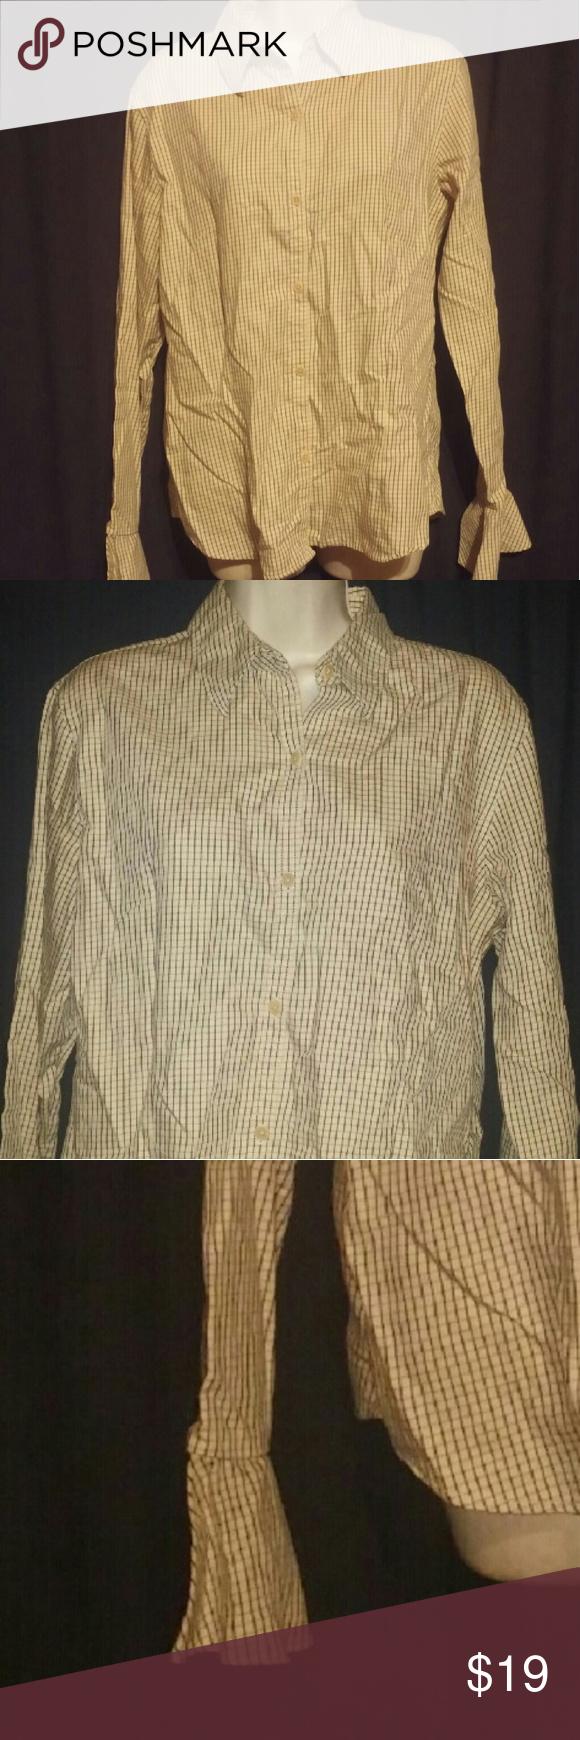 59d299531095 Beige Black Checkered Ruffle Cuff Top L Like new 100% cotton shirt. Ruffle  cuffs. Great for work or casual wear Lauren Ralph Lauren Tops Blouses